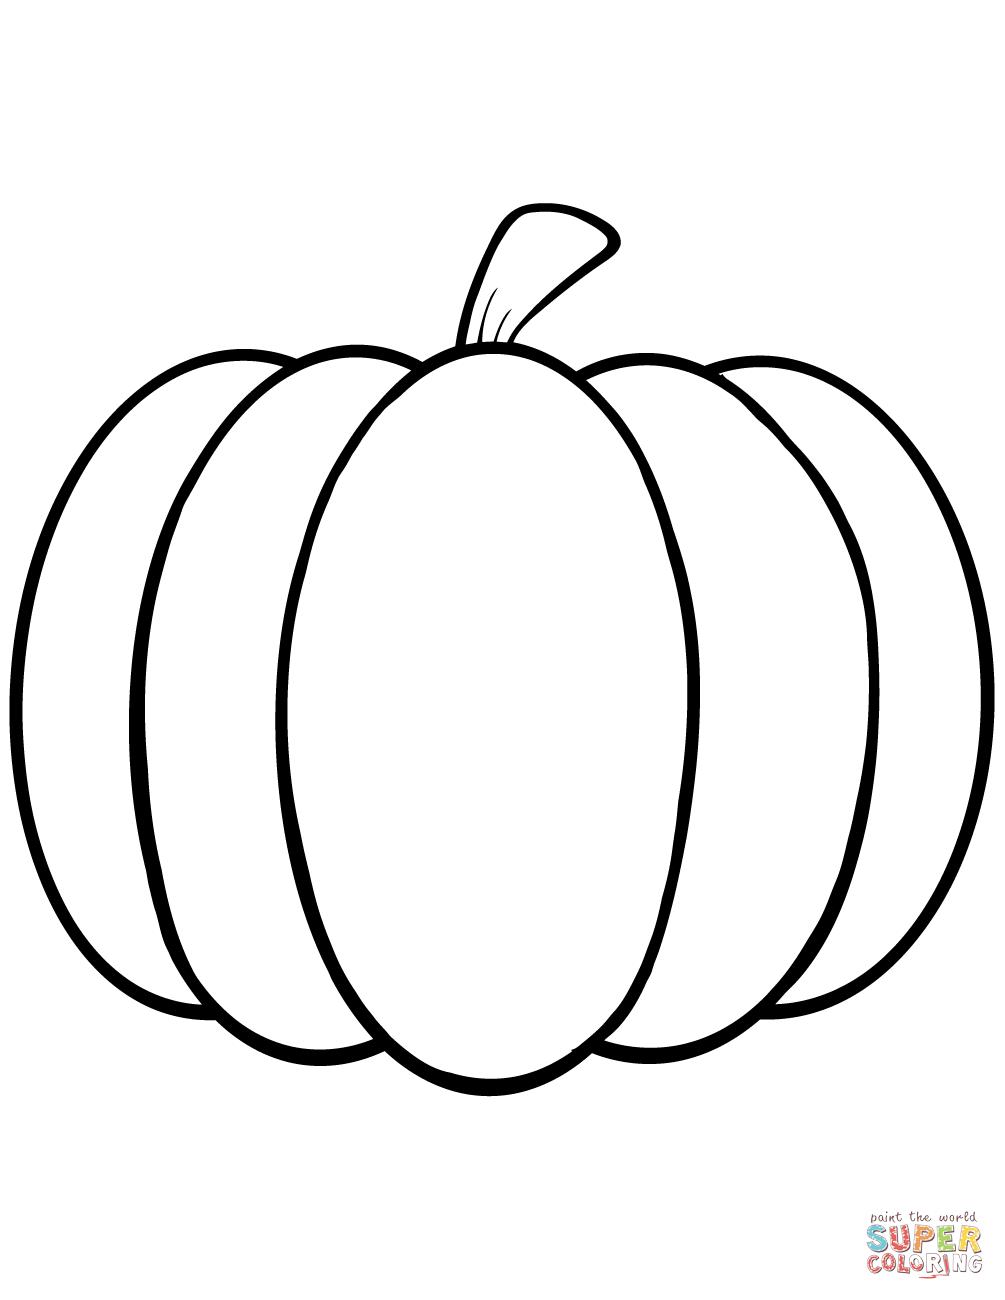 1005x1300 Easy Pumpkin Coloring Patterns Preschool Printable Pumpkin Pattern